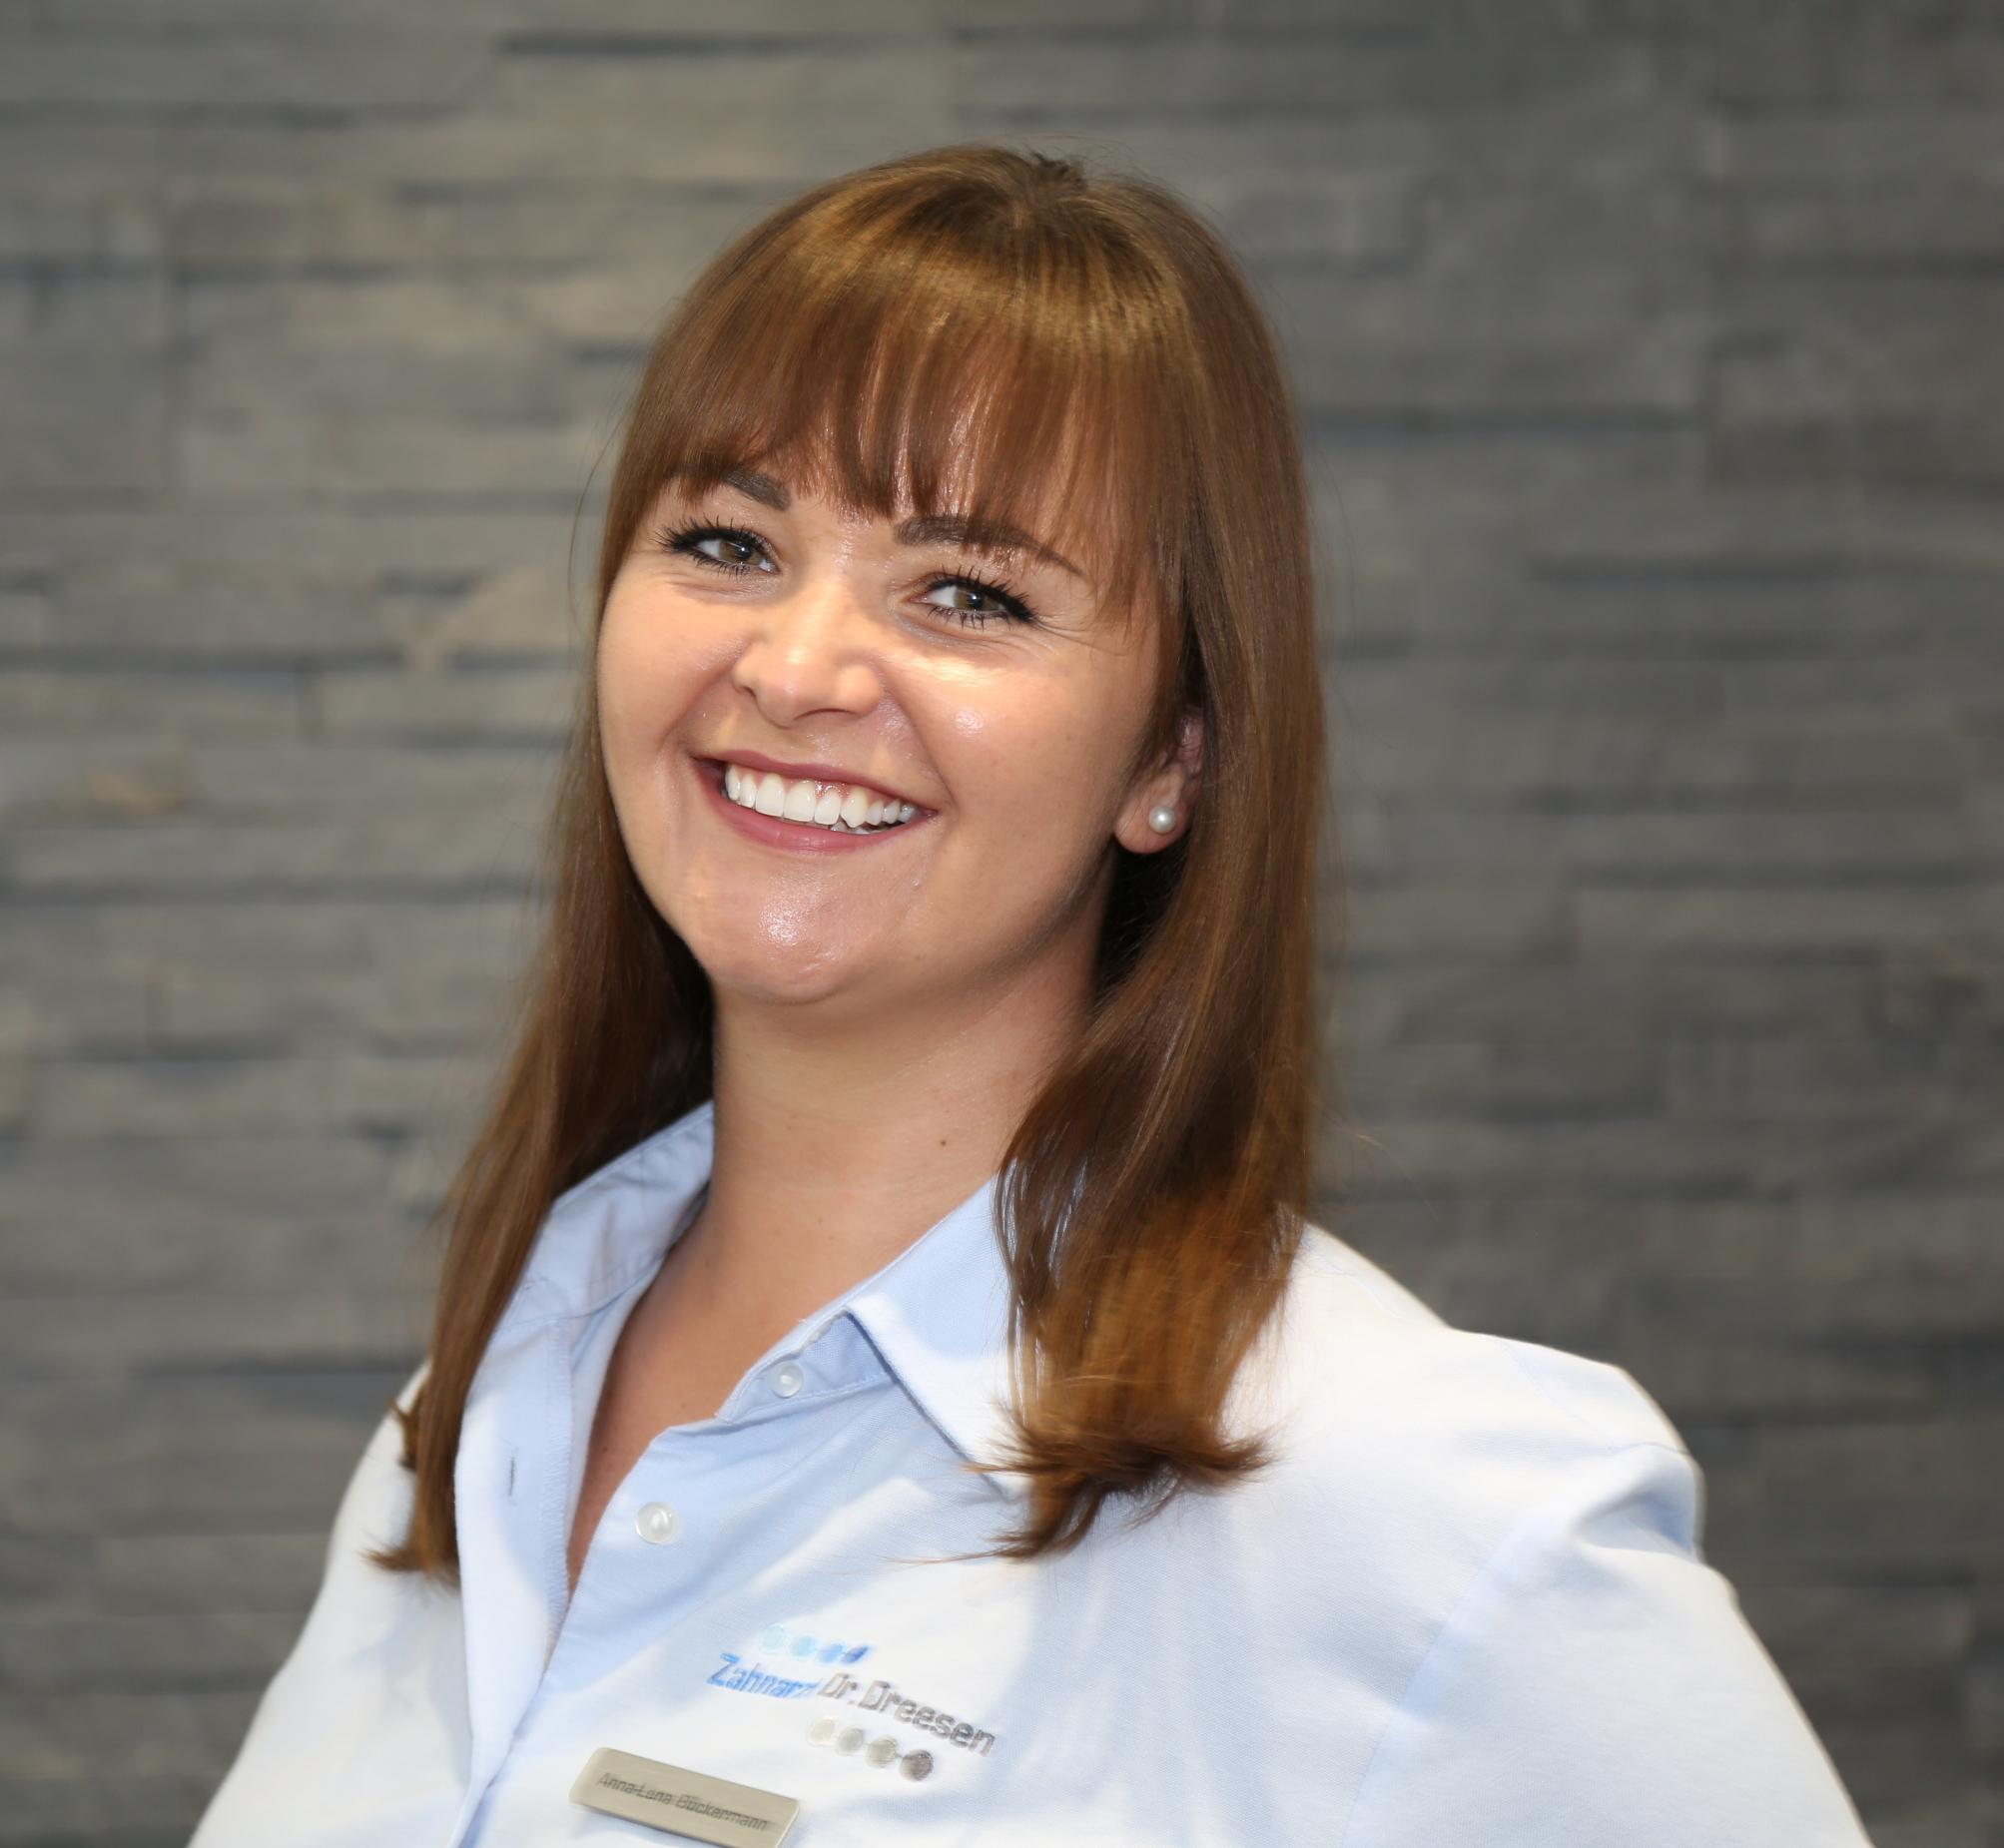 Anna-Lena Bückermann